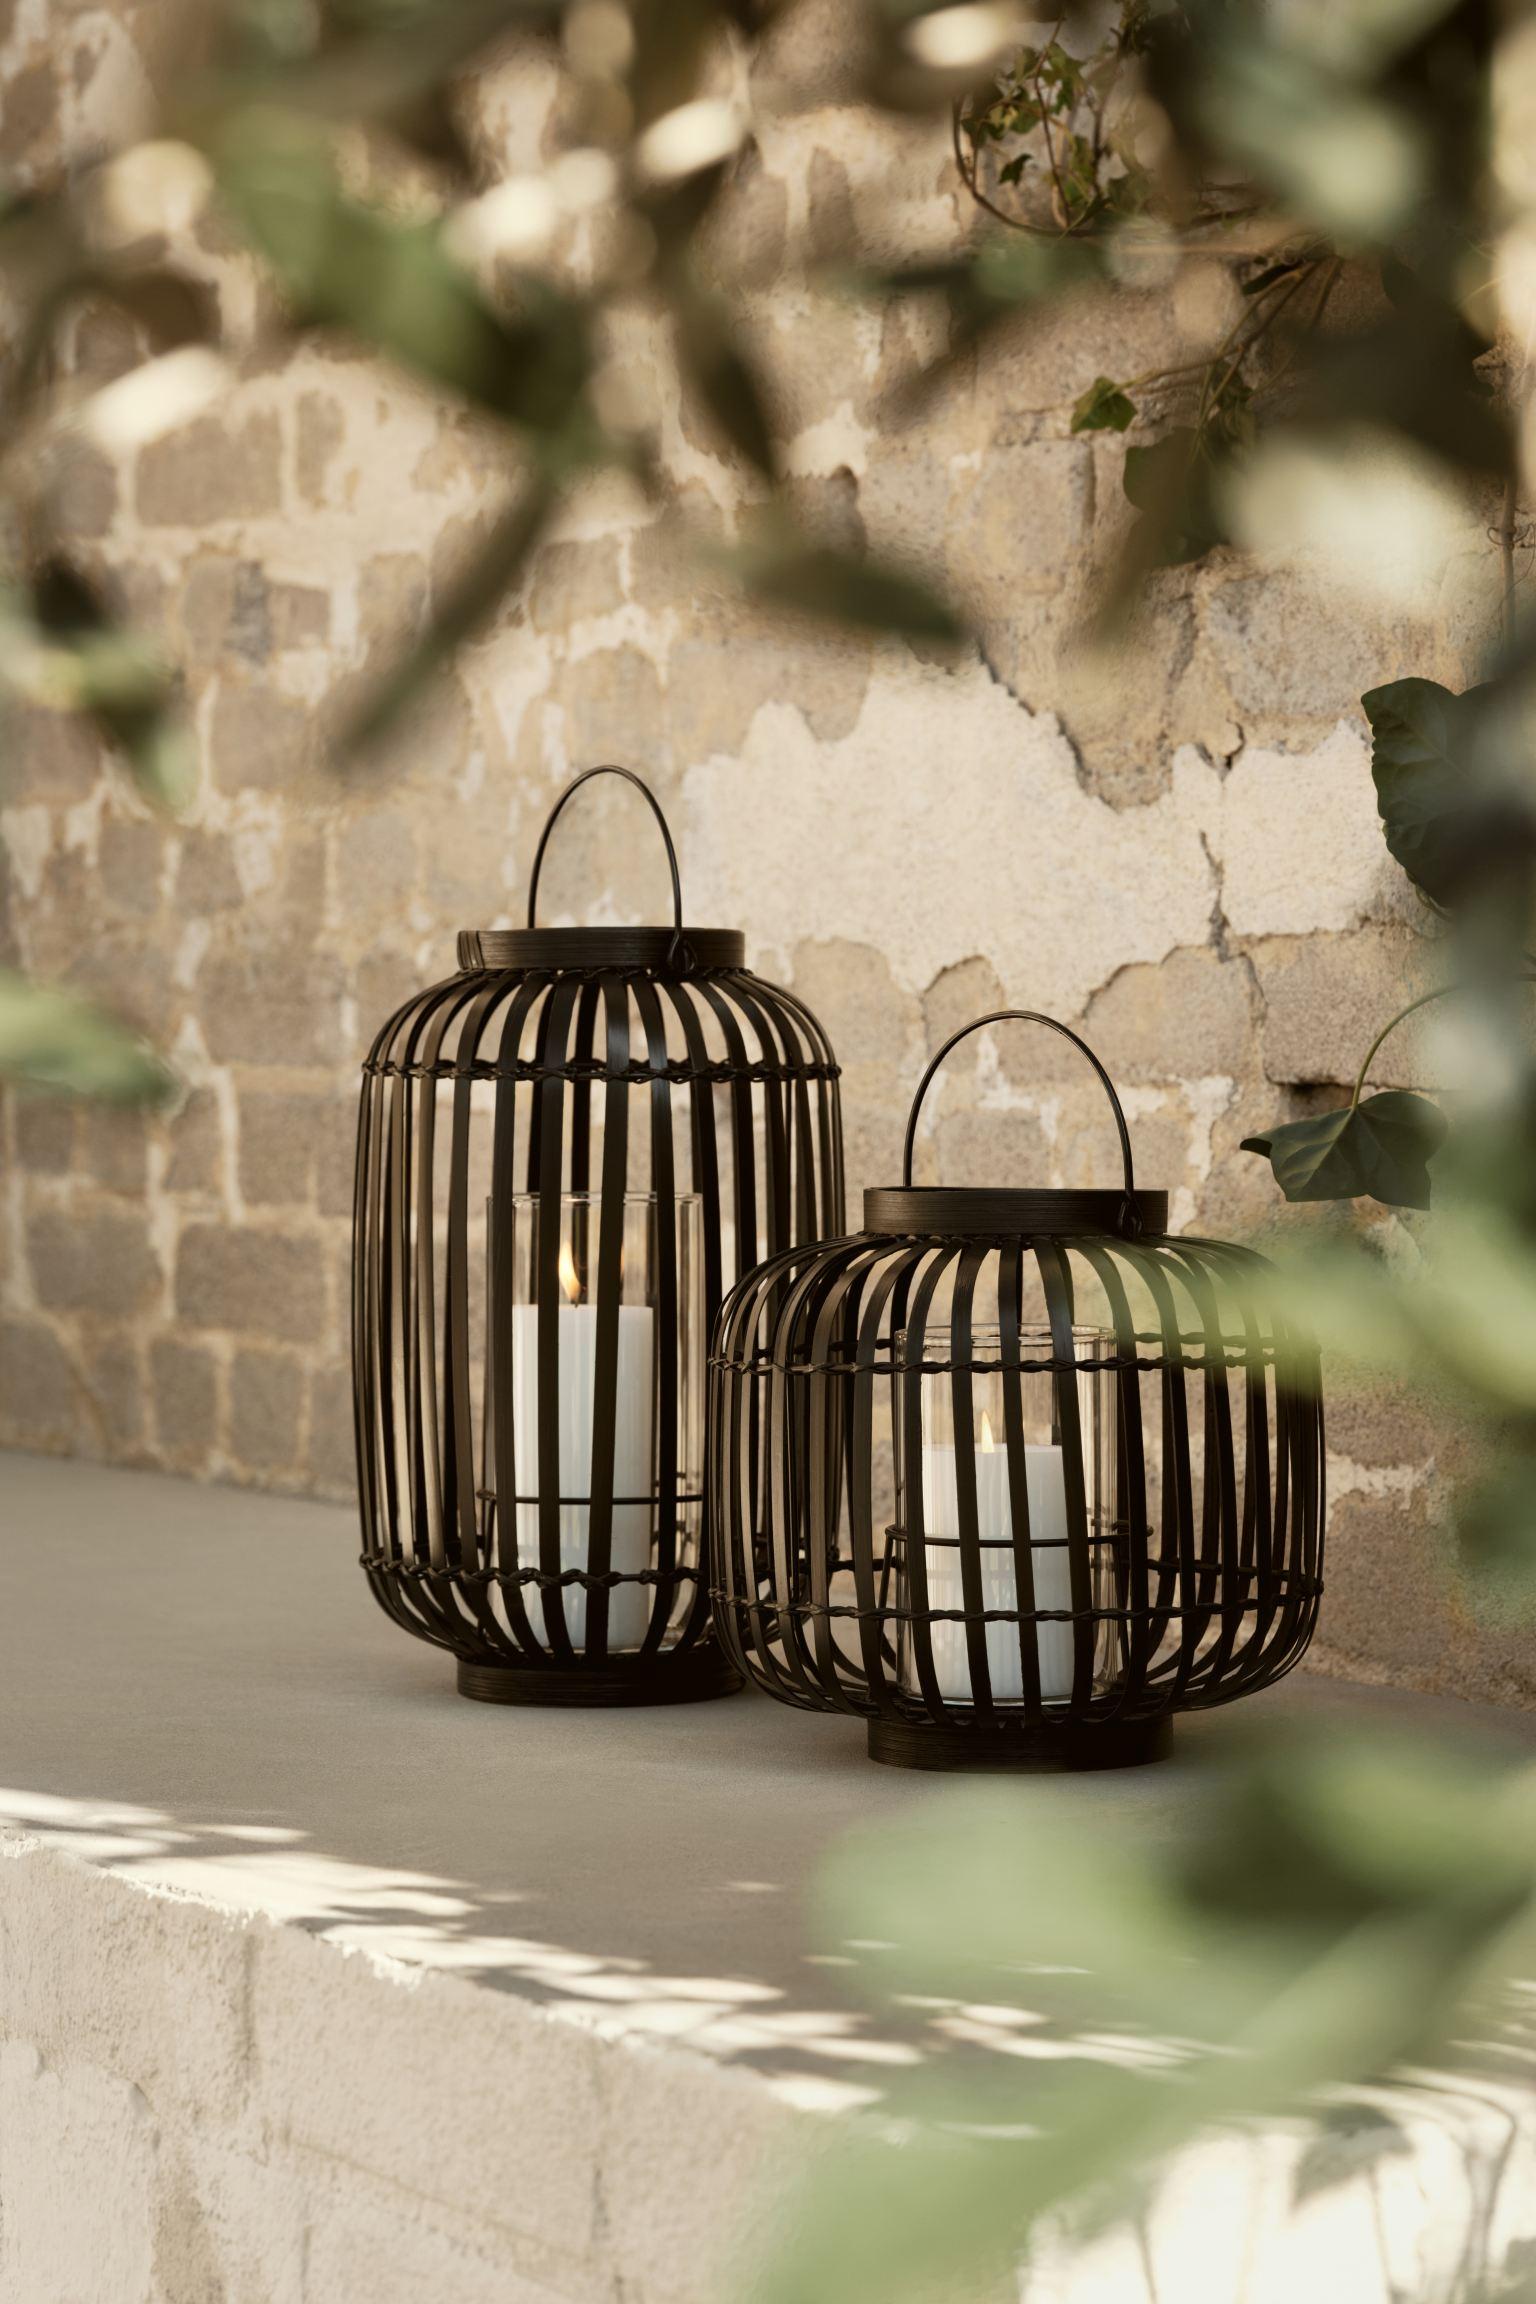 Farolillo de metal revestido en bambú con portavelas de vidrio y asa arriba. Diámetro aprox. 21,5 cm. Alto 34 cm.